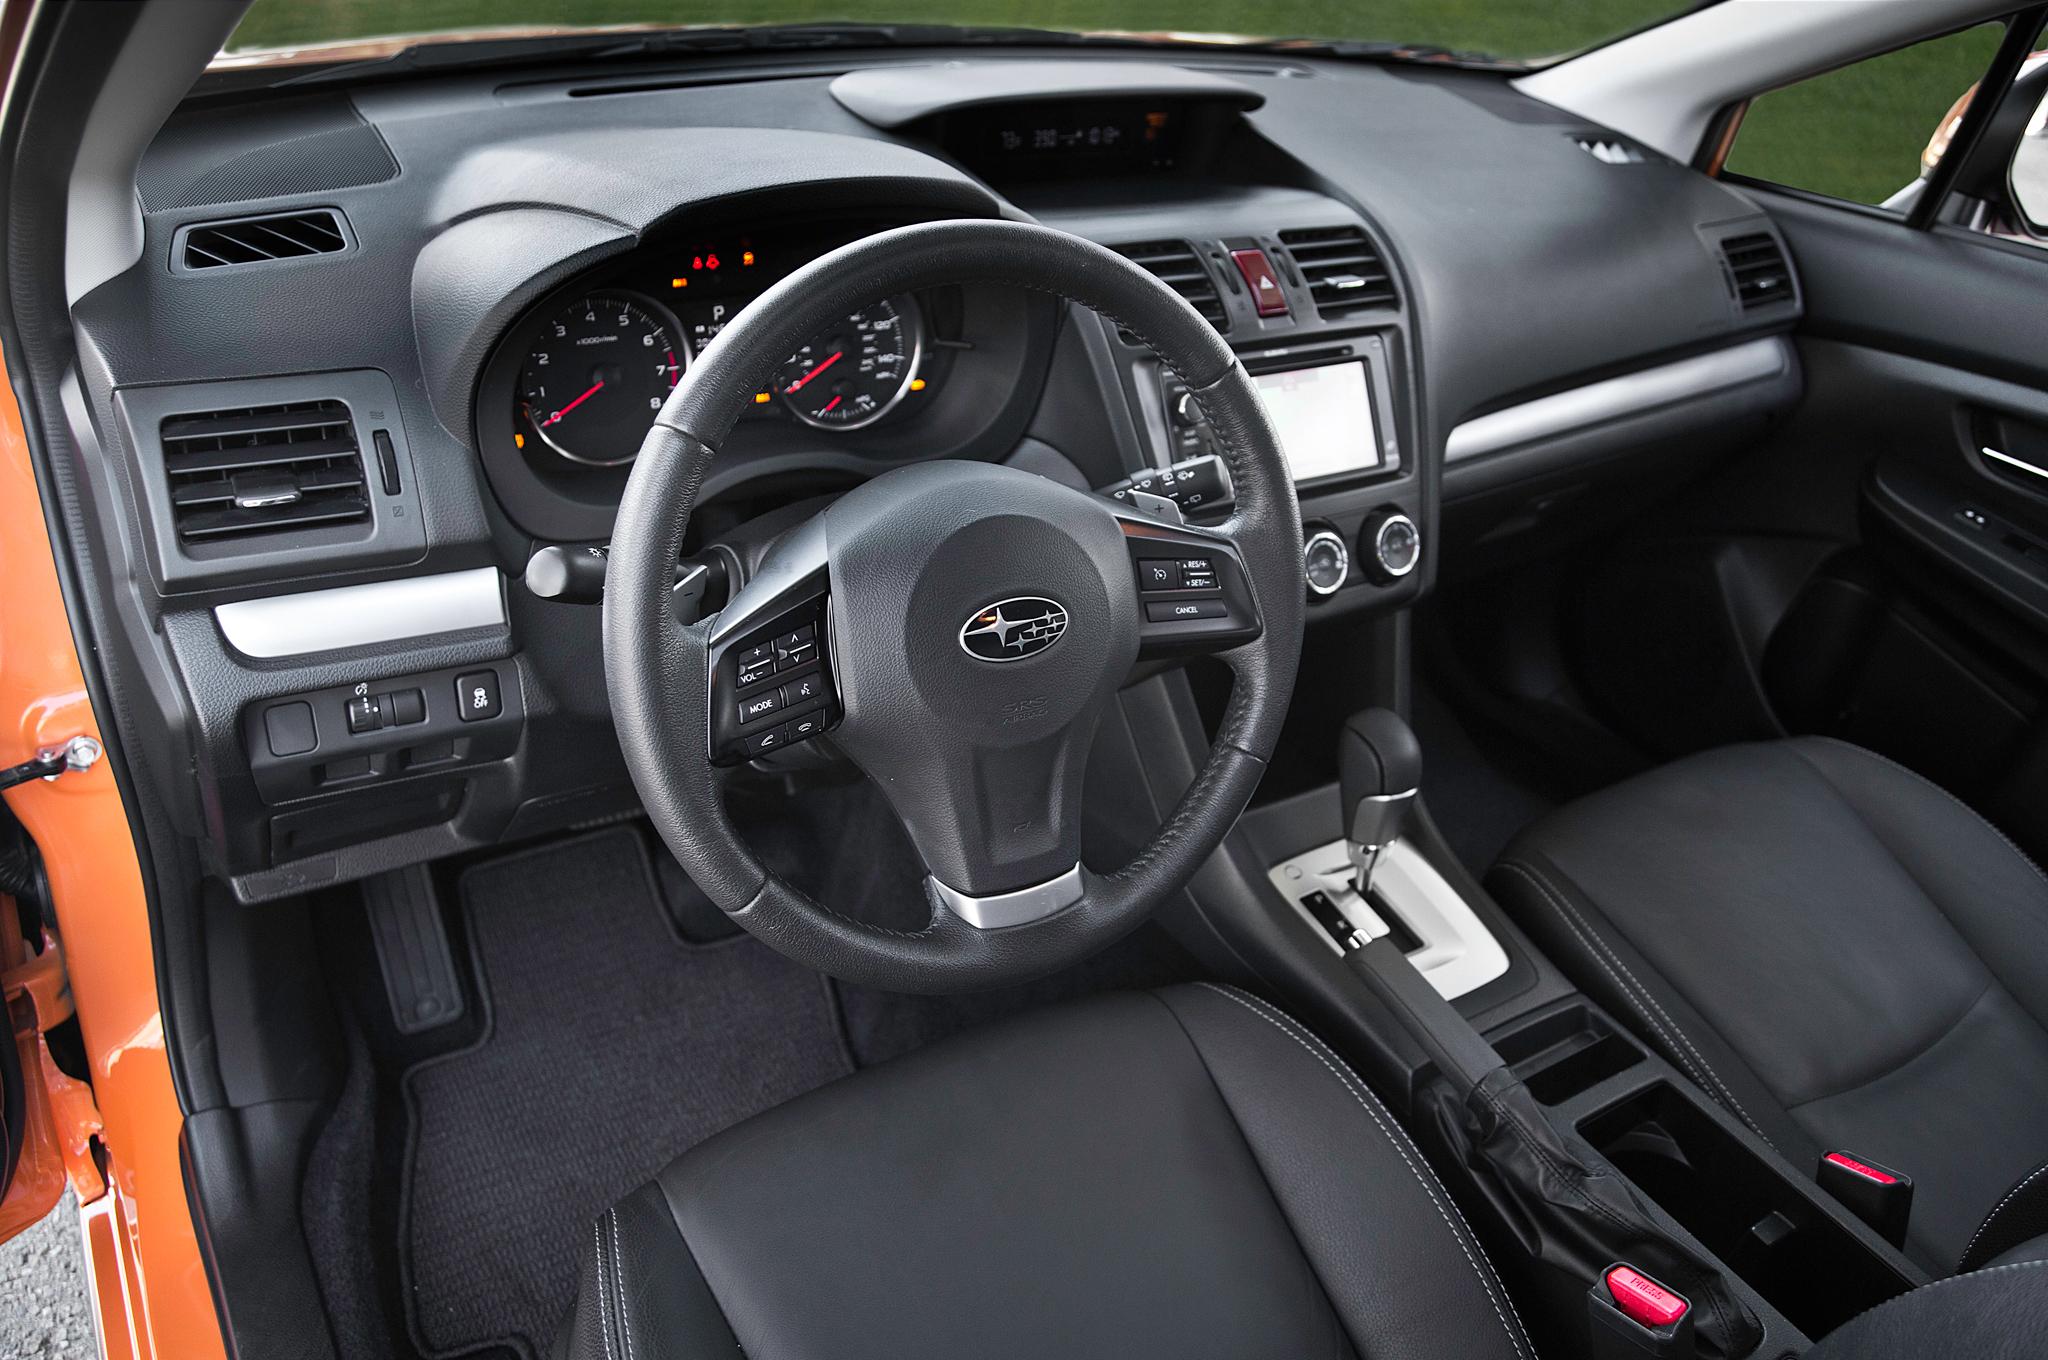 2014 Subaru Xv Crosstrek 2.0I Limited >> 2013 Subaru Xv Crosstrek 2 0i Limited First Test Photo